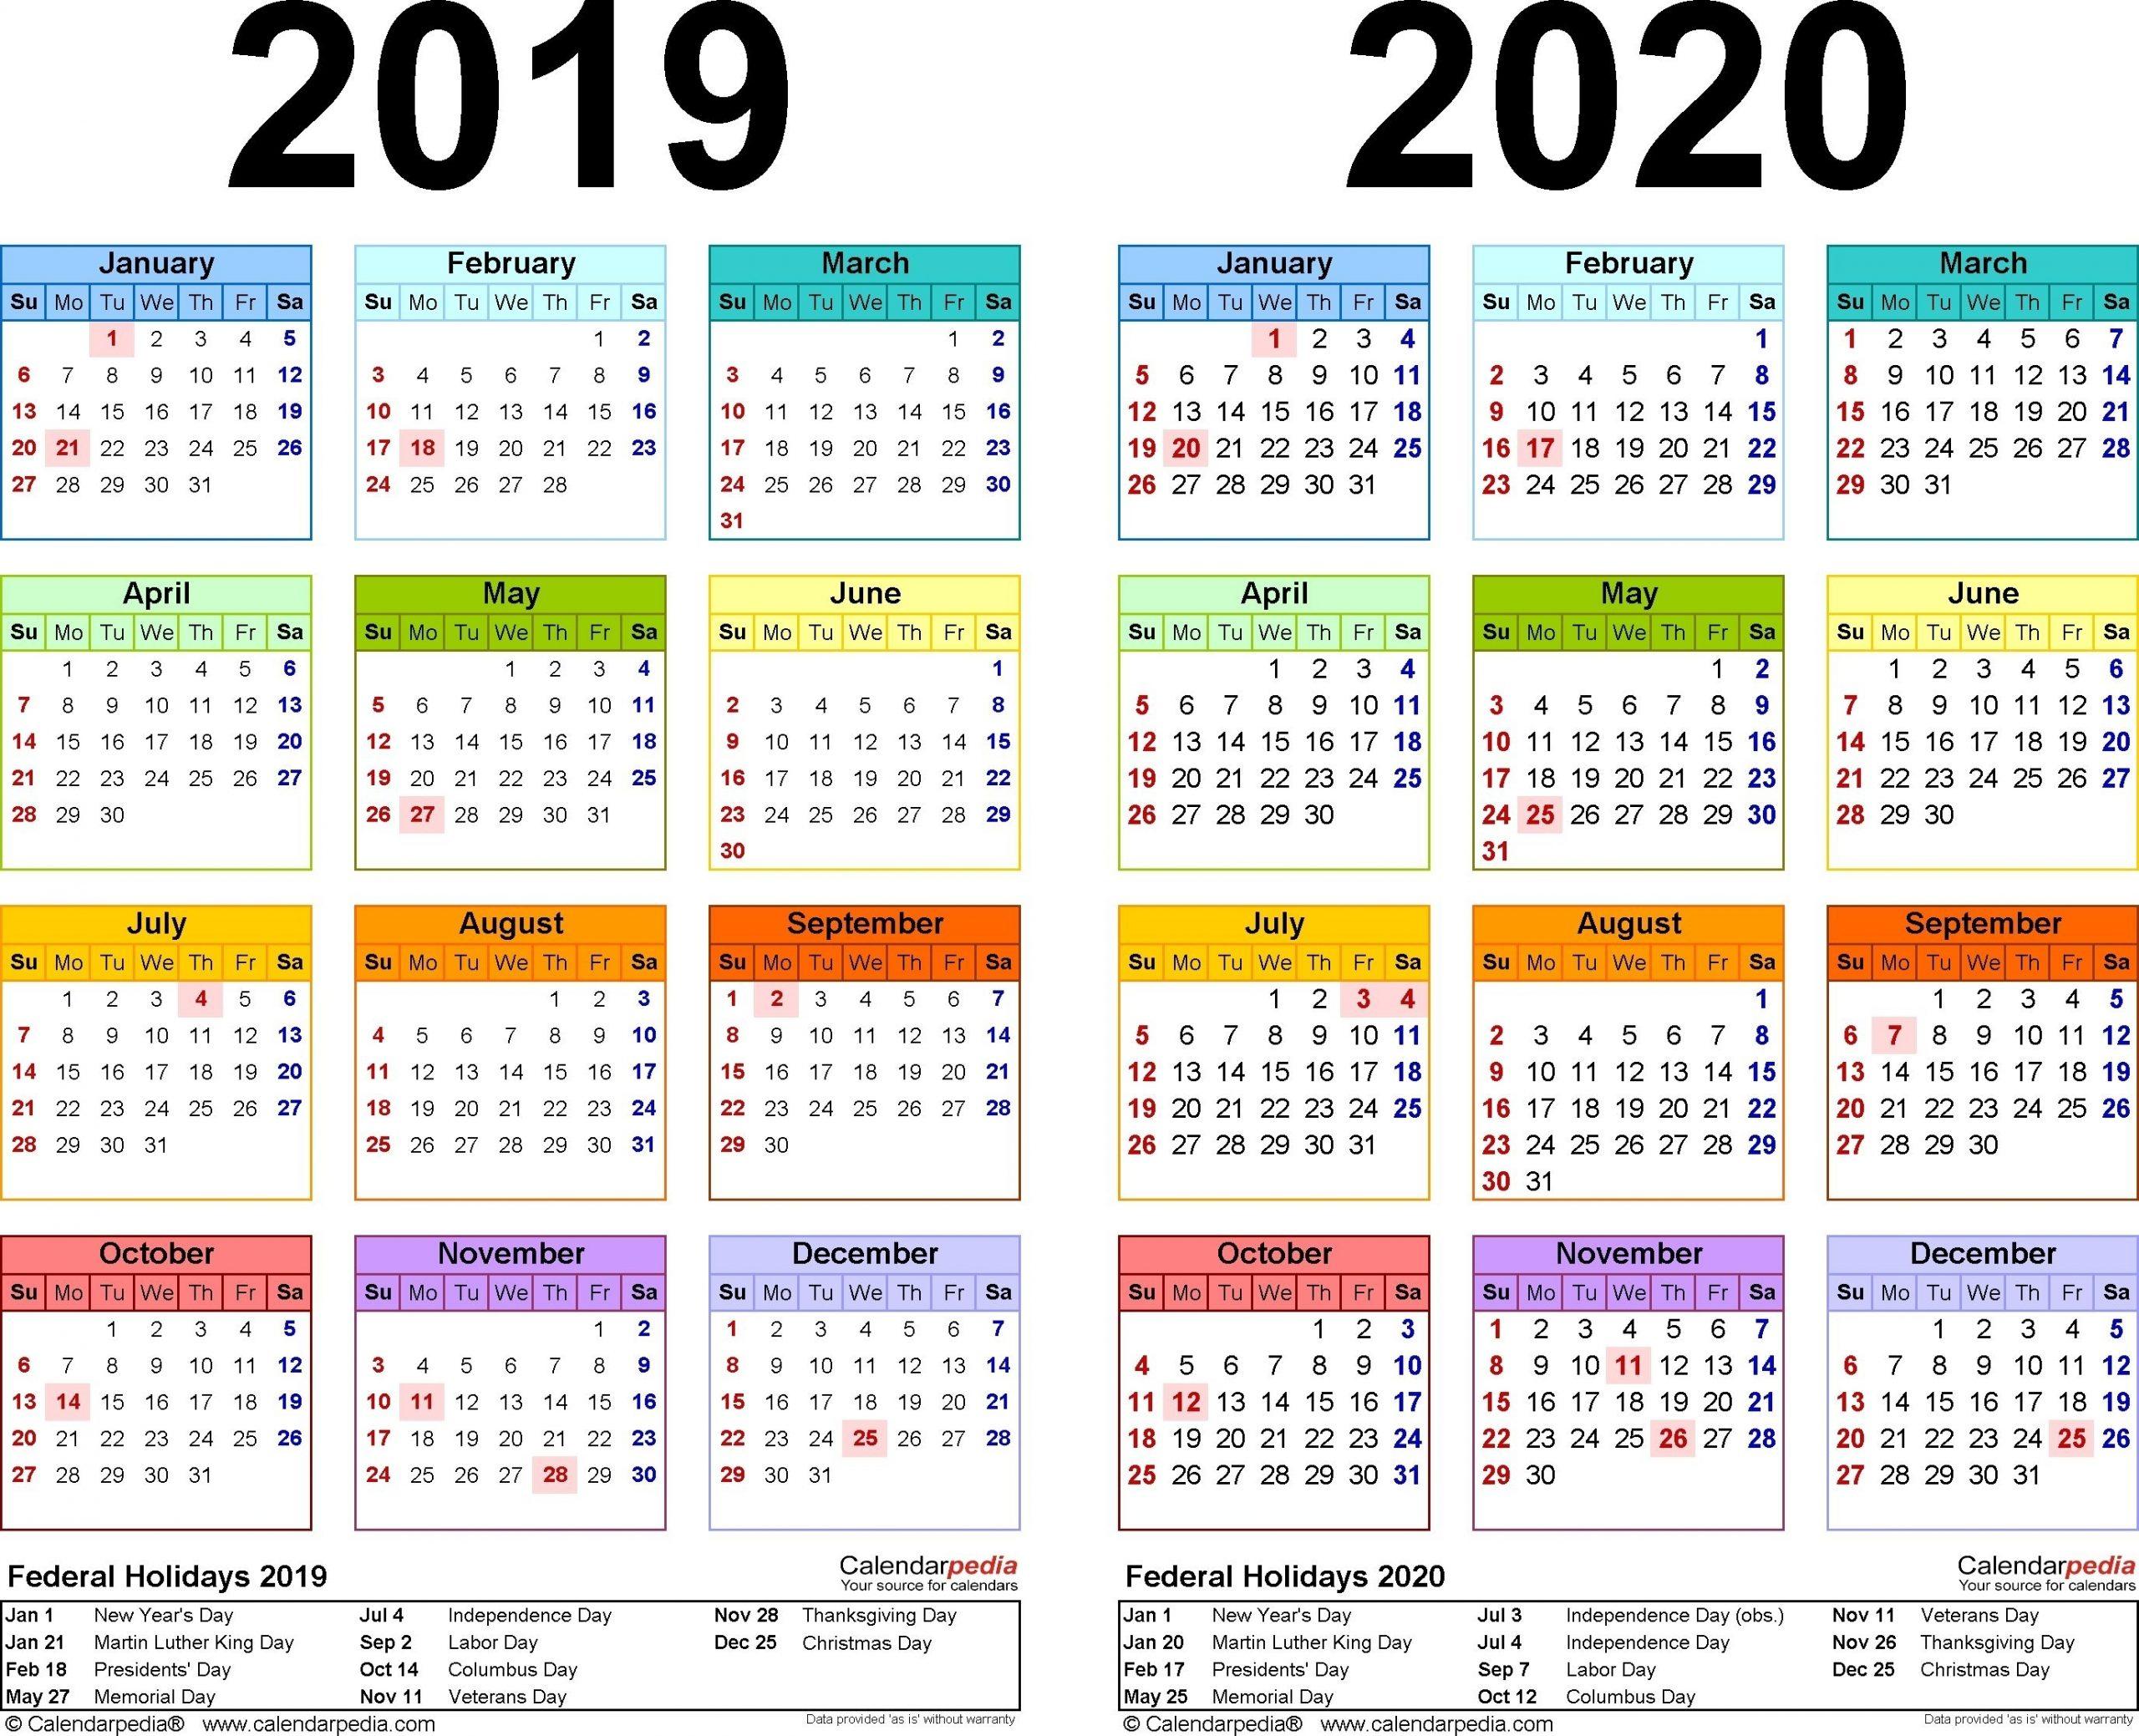 Year Calendar 2020 Special Days In 2020 | Calendar Template with regard to Special Days Of The Year 2020 Calendar